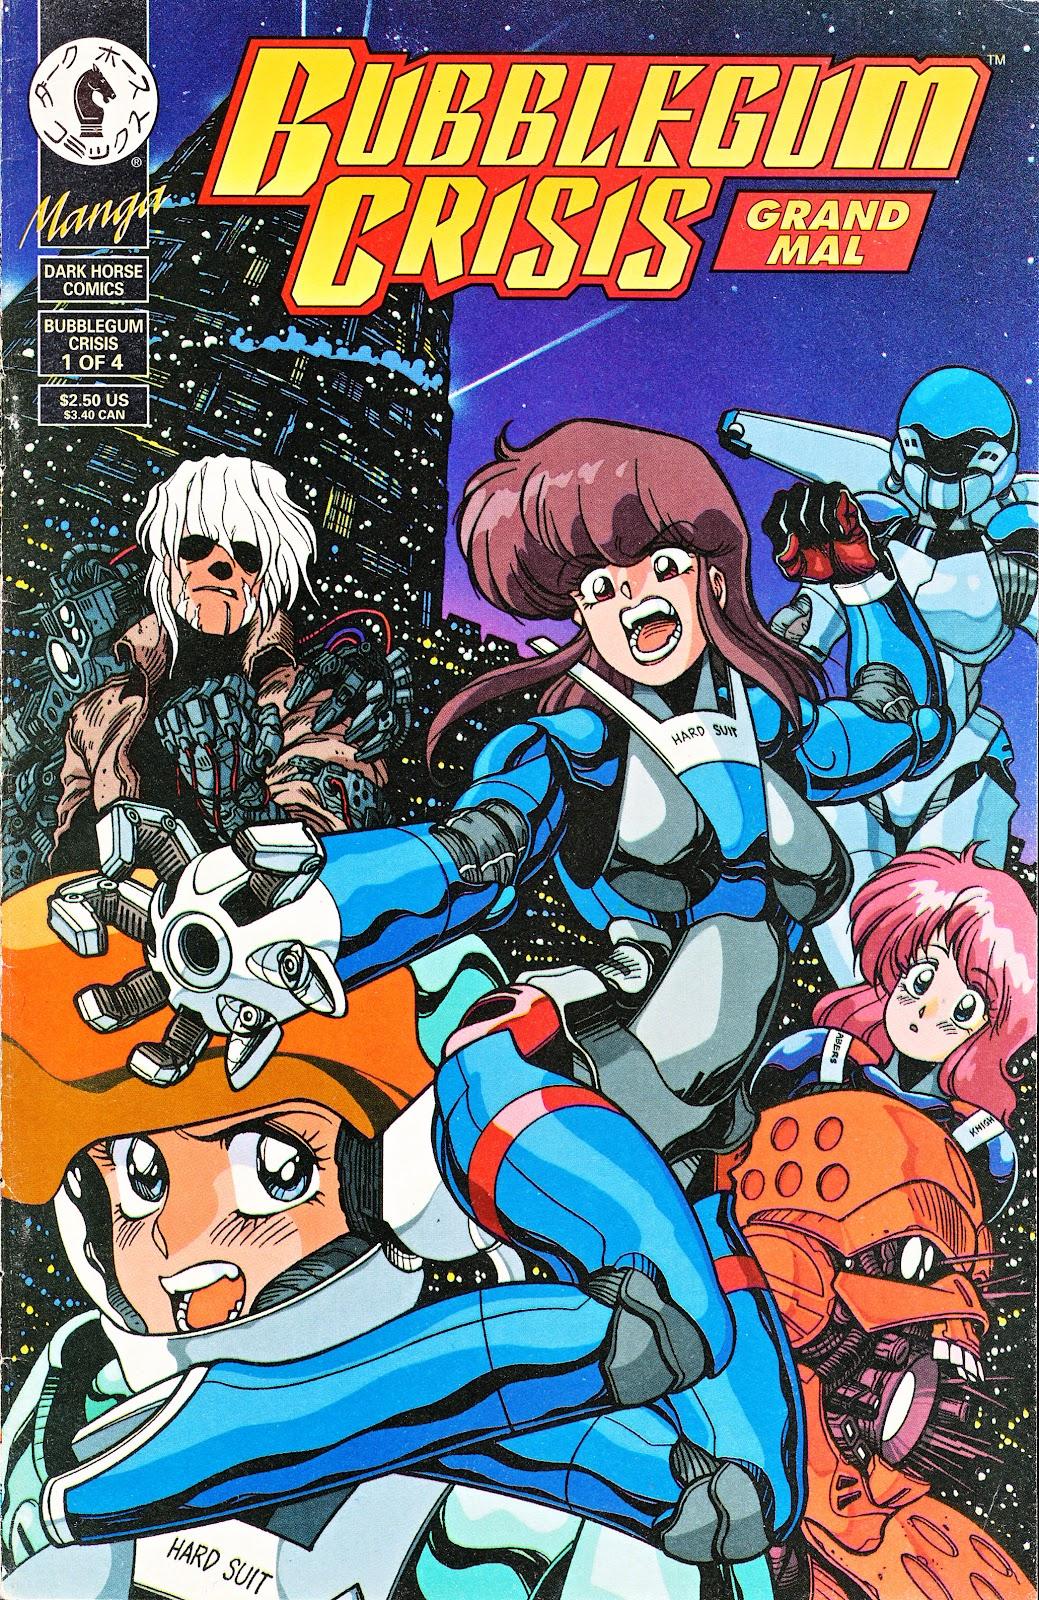 Bubblegum Crisis: Grand Mal issue 1 - Page 1